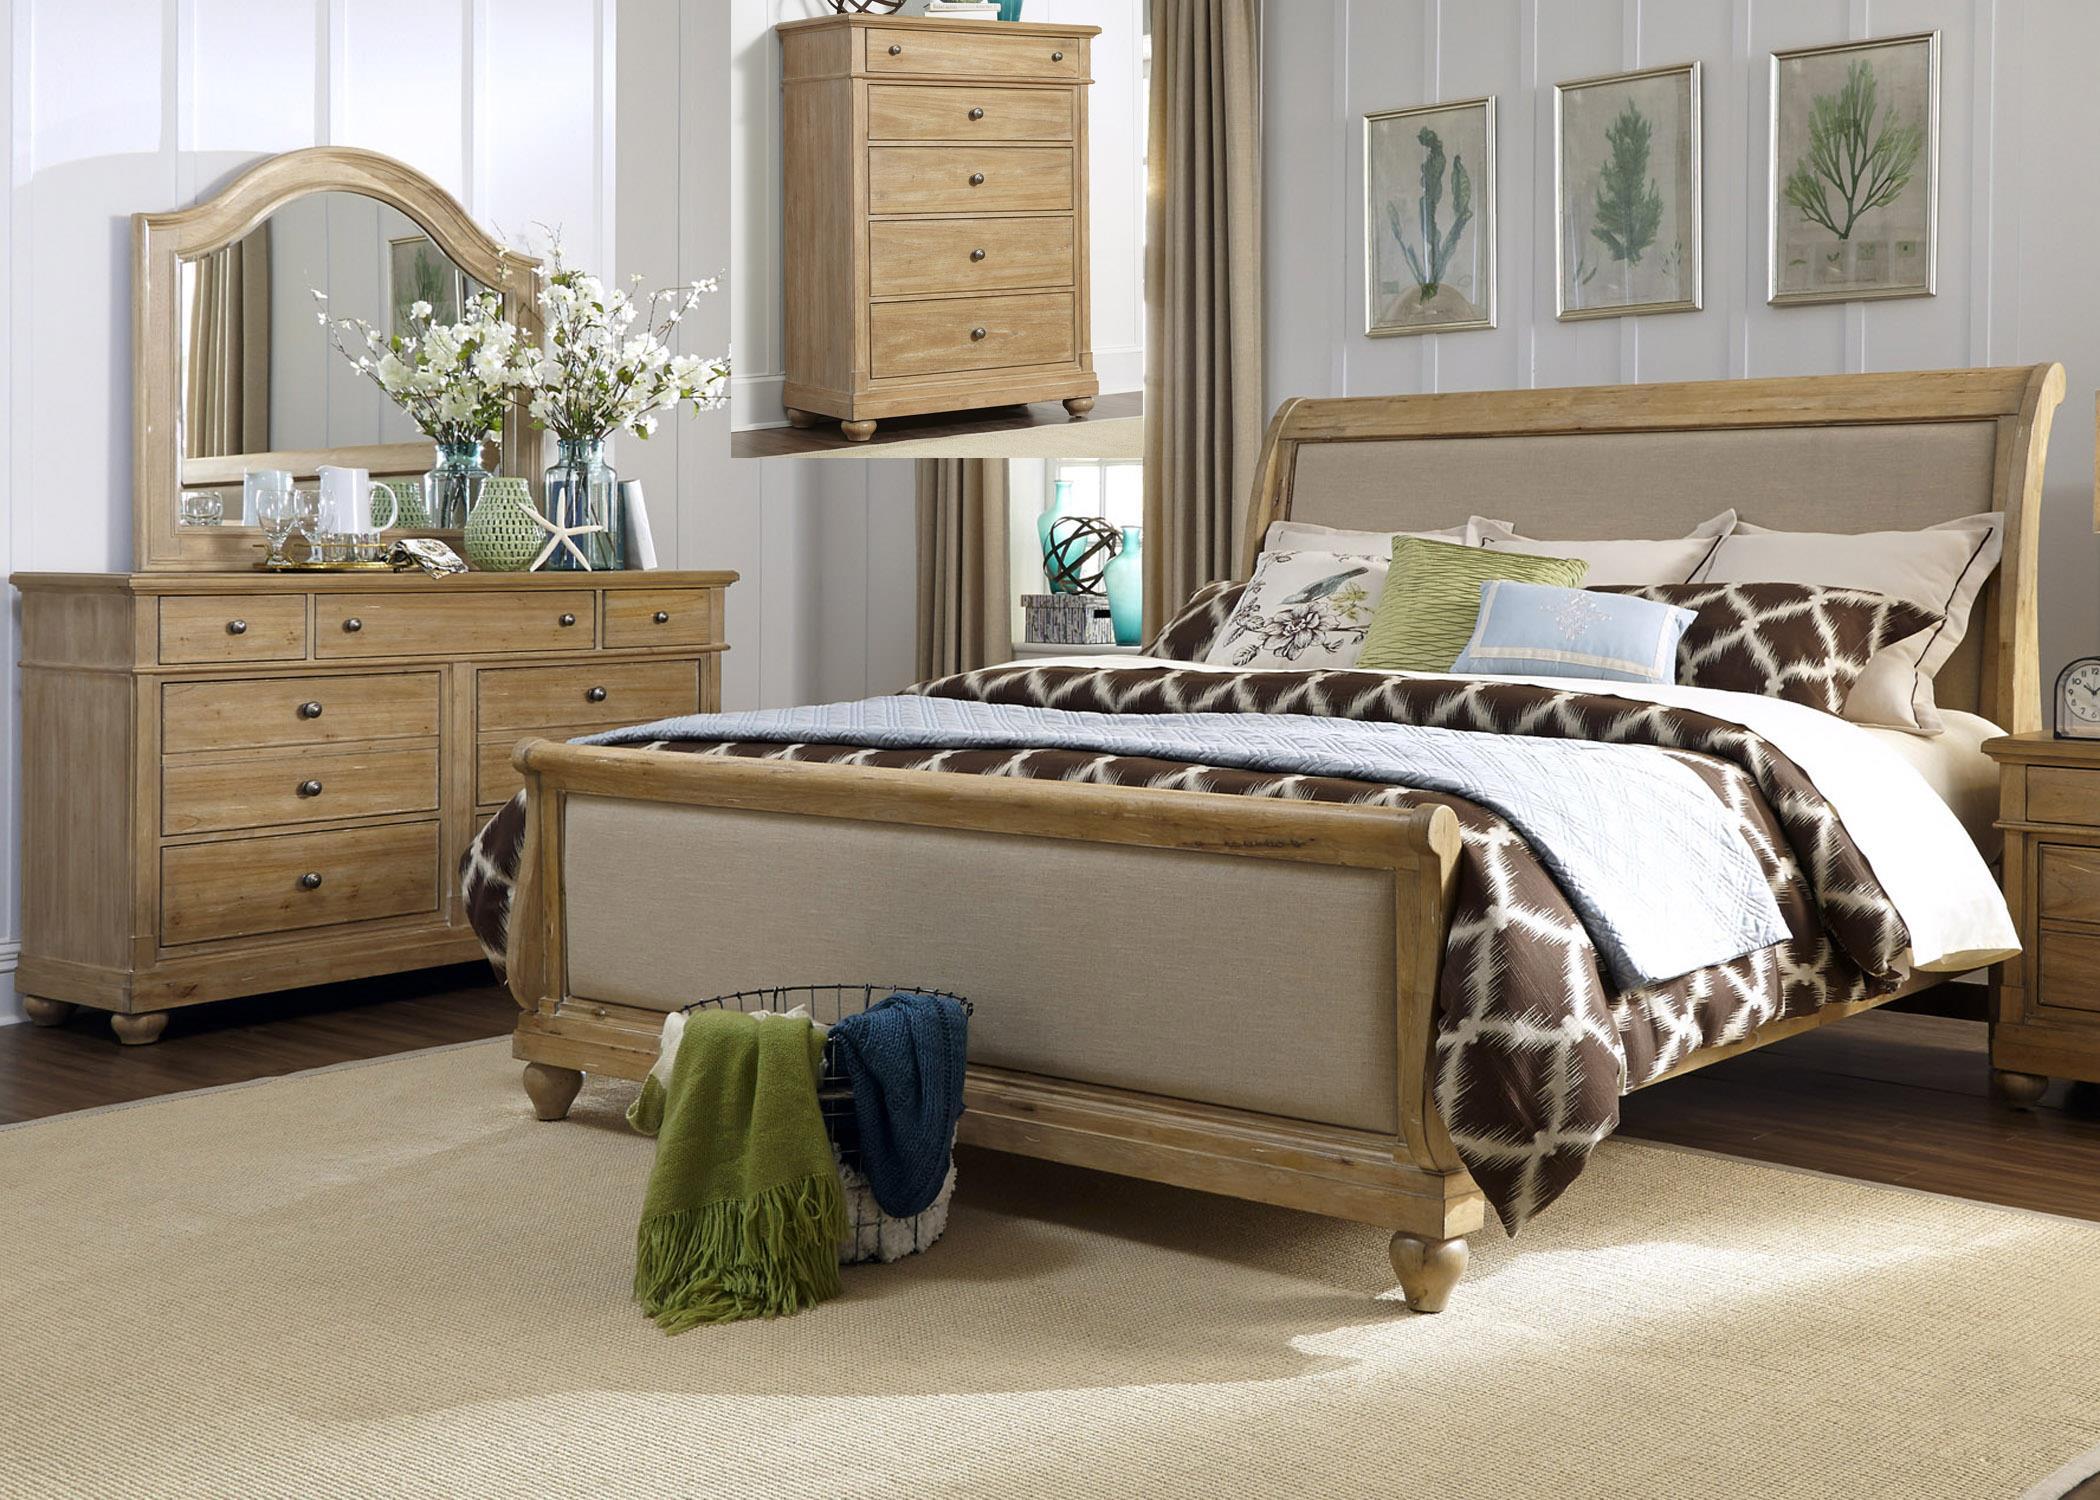 Liberty Furniture Harbor View King Bedroom Group - Item Number: 531-BR-KSLDMC